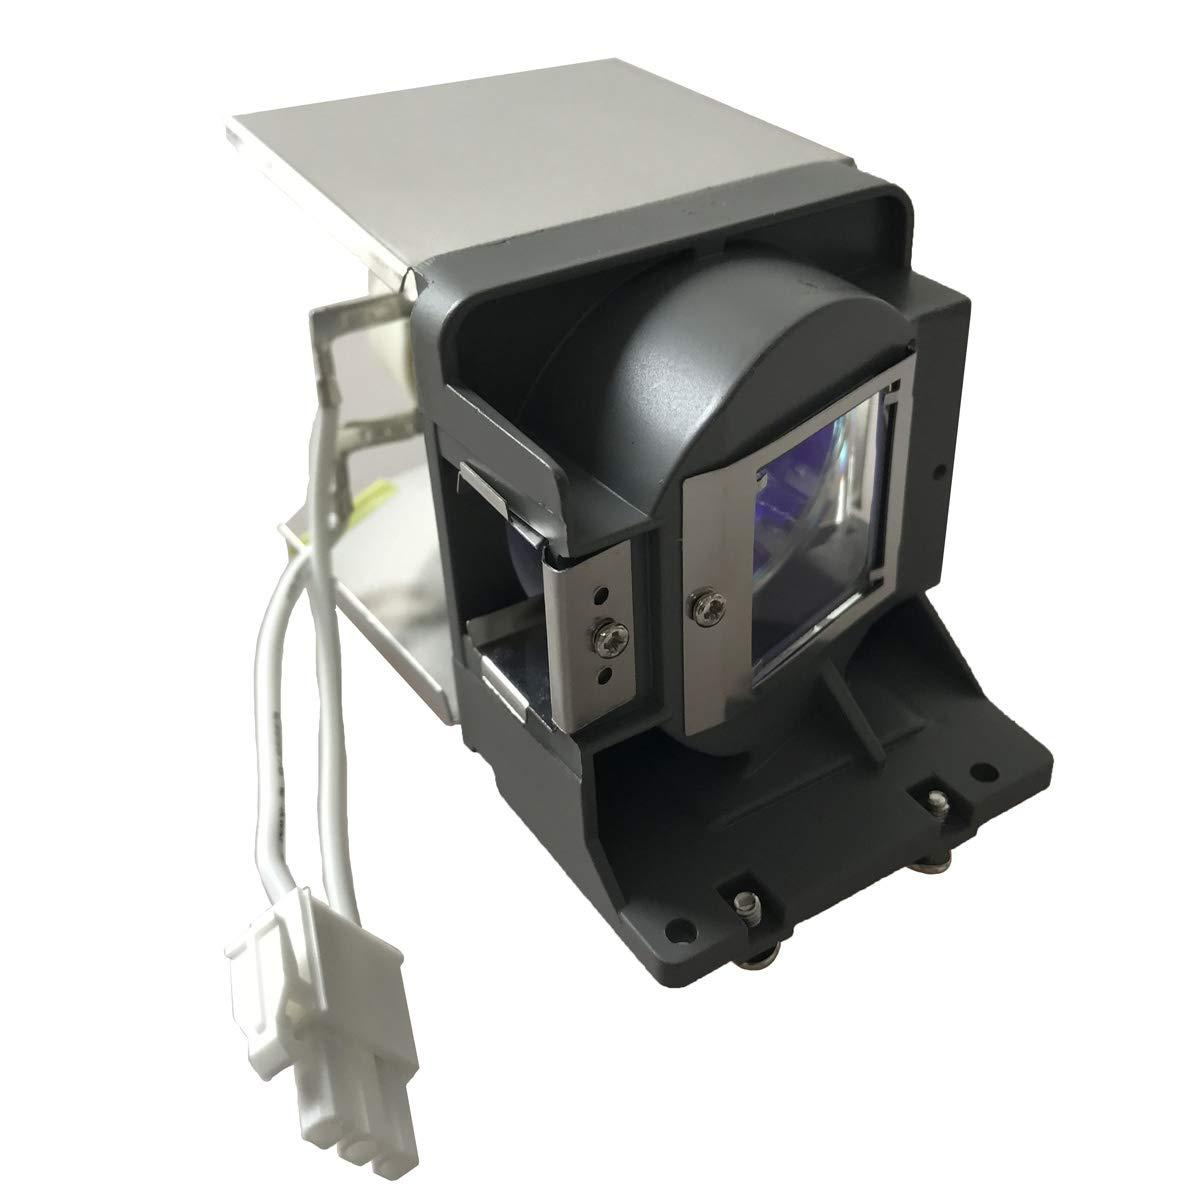 EachLight プロジェクター 交換用 ランプ 5J.J5E05.001(互換性のあるランプ) ベンキューBENQ MS513、MW516、MX514 対応   B07GFN8KMB